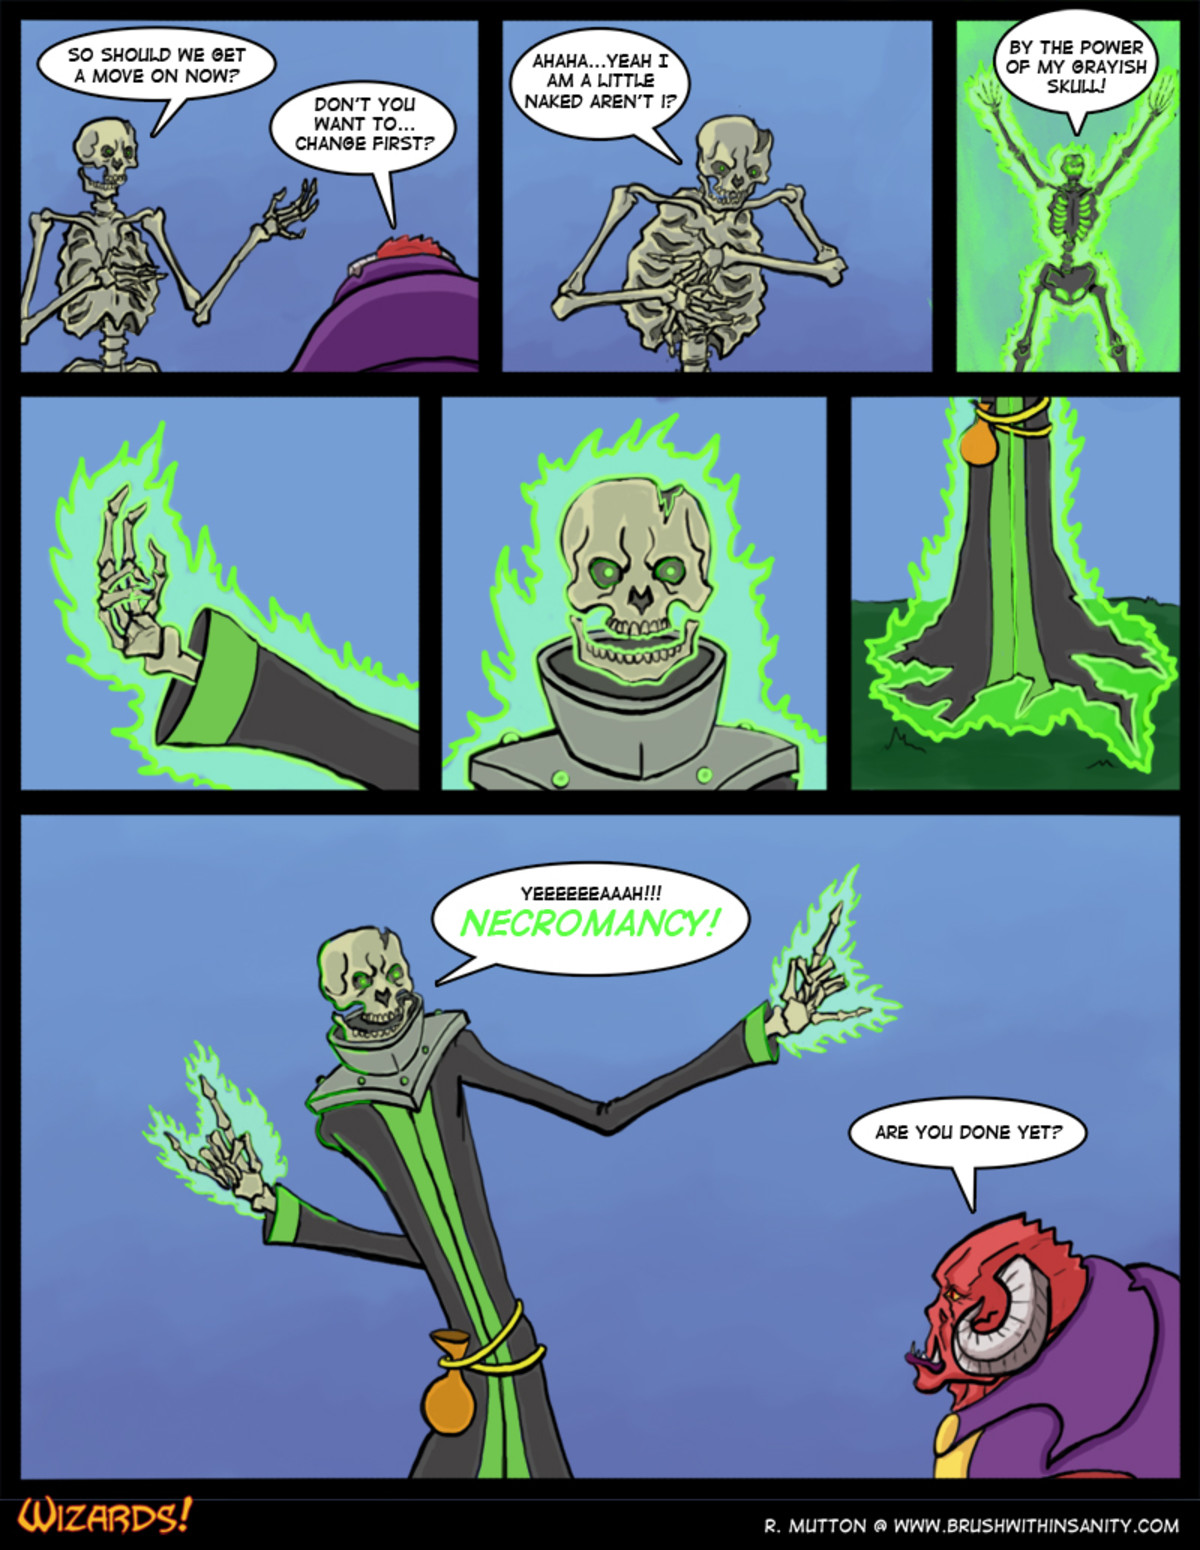 muffled skeleton warriors theme starts to play. .